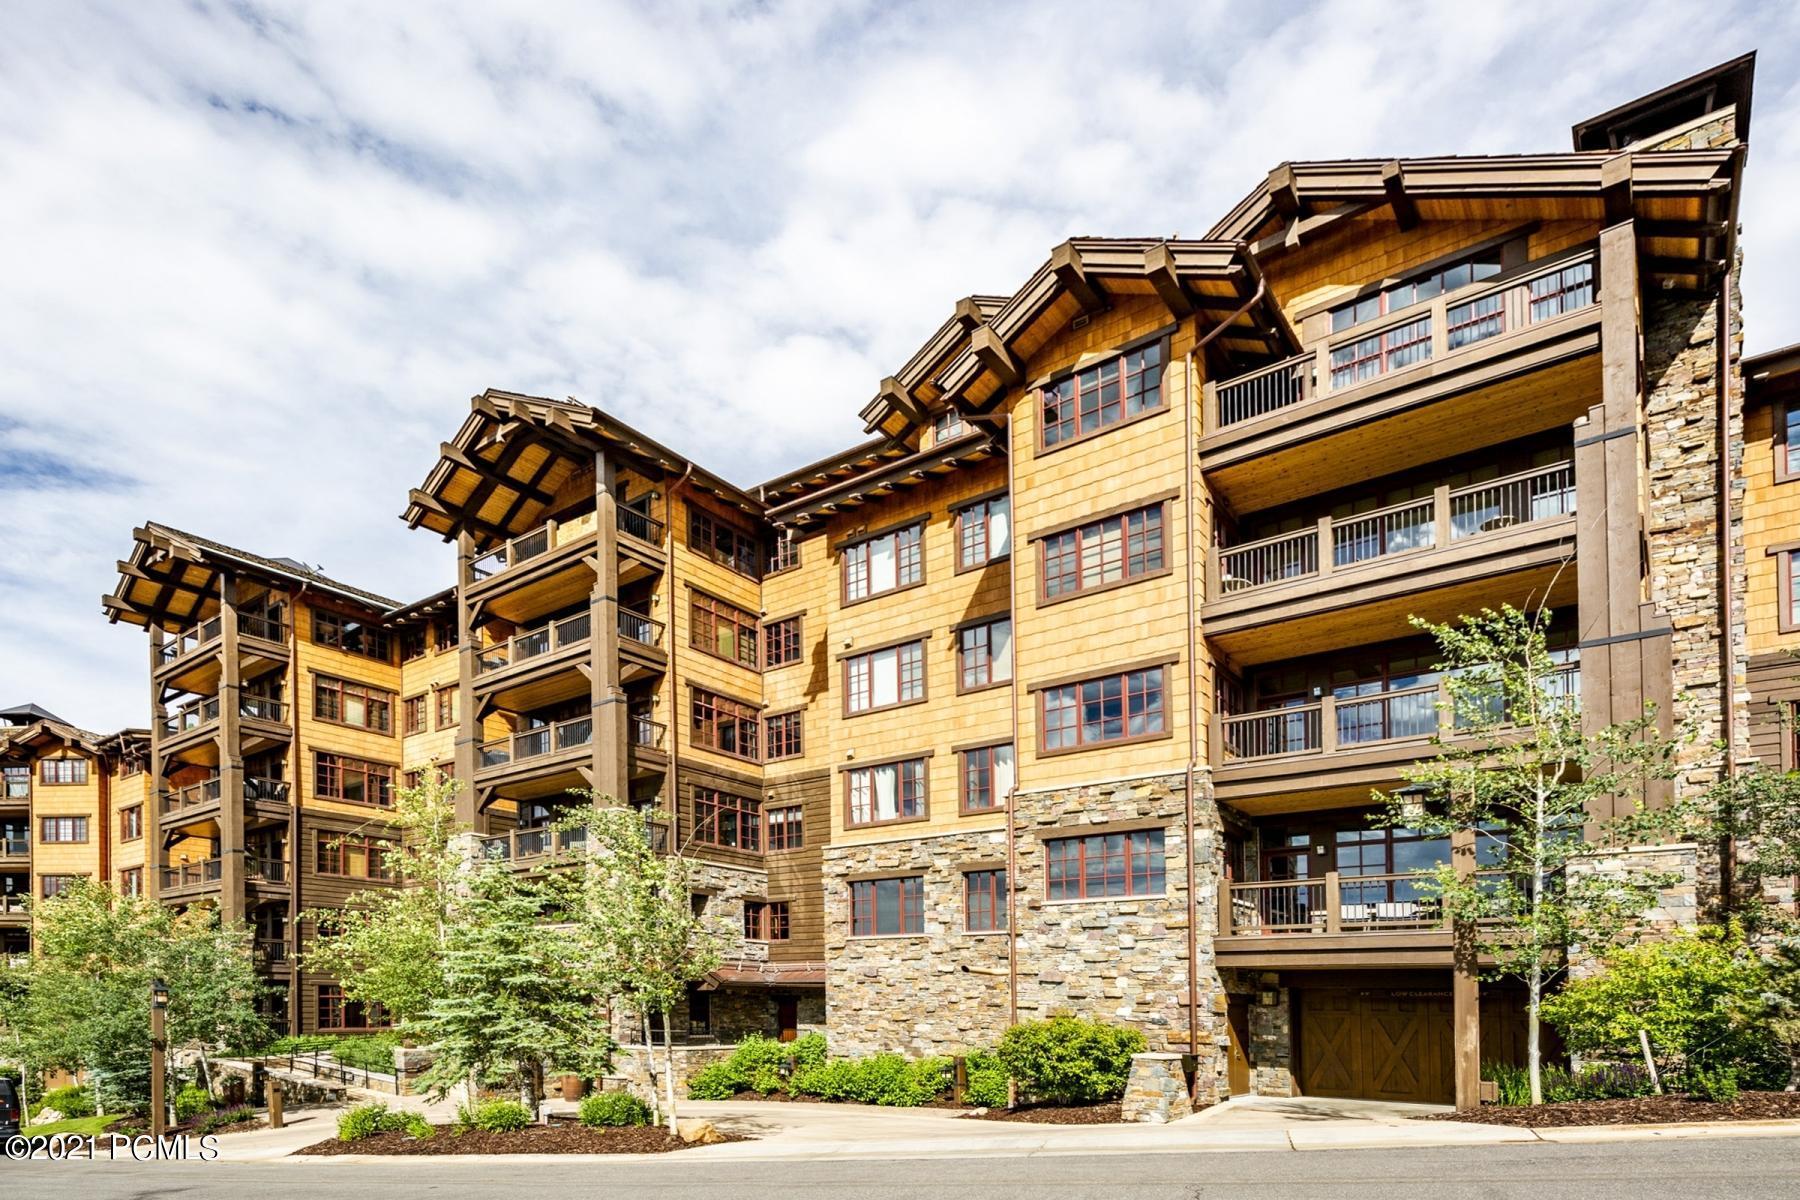 8894 Empire Club Drive, Park City, Utah 84060, 3 Bedrooms Bedrooms, ,4 BathroomsBathrooms,Condominium,For Sale,Empire Club,12103000